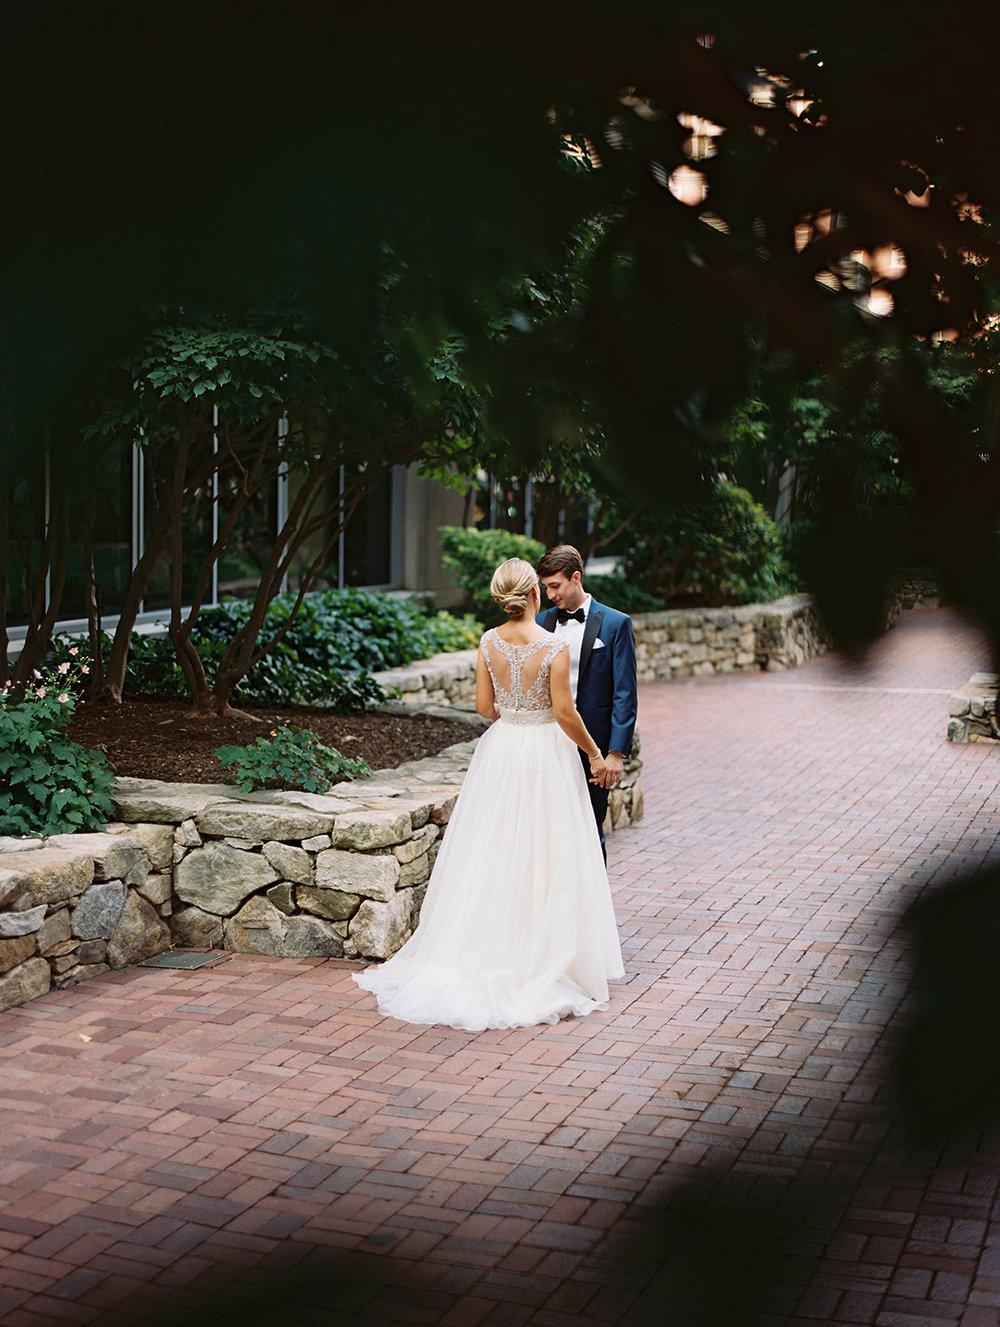 154-andrew-megan-boston-public-library-wedding-film-photographer.jpg